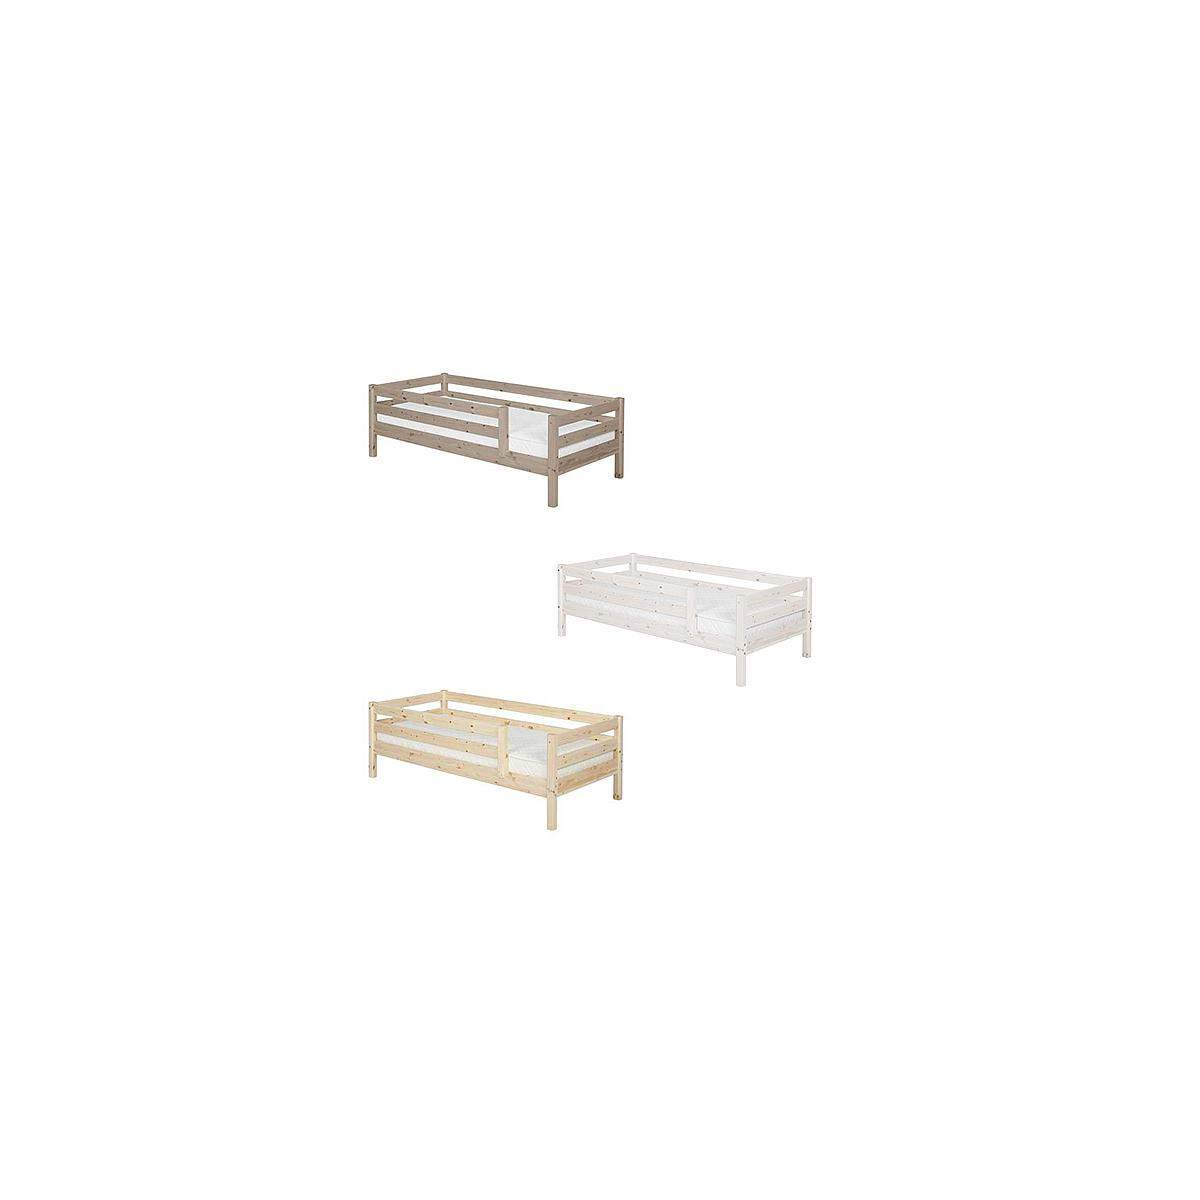 Cama individual barrera 3/4 90x190 CLASSIC Flexa terra